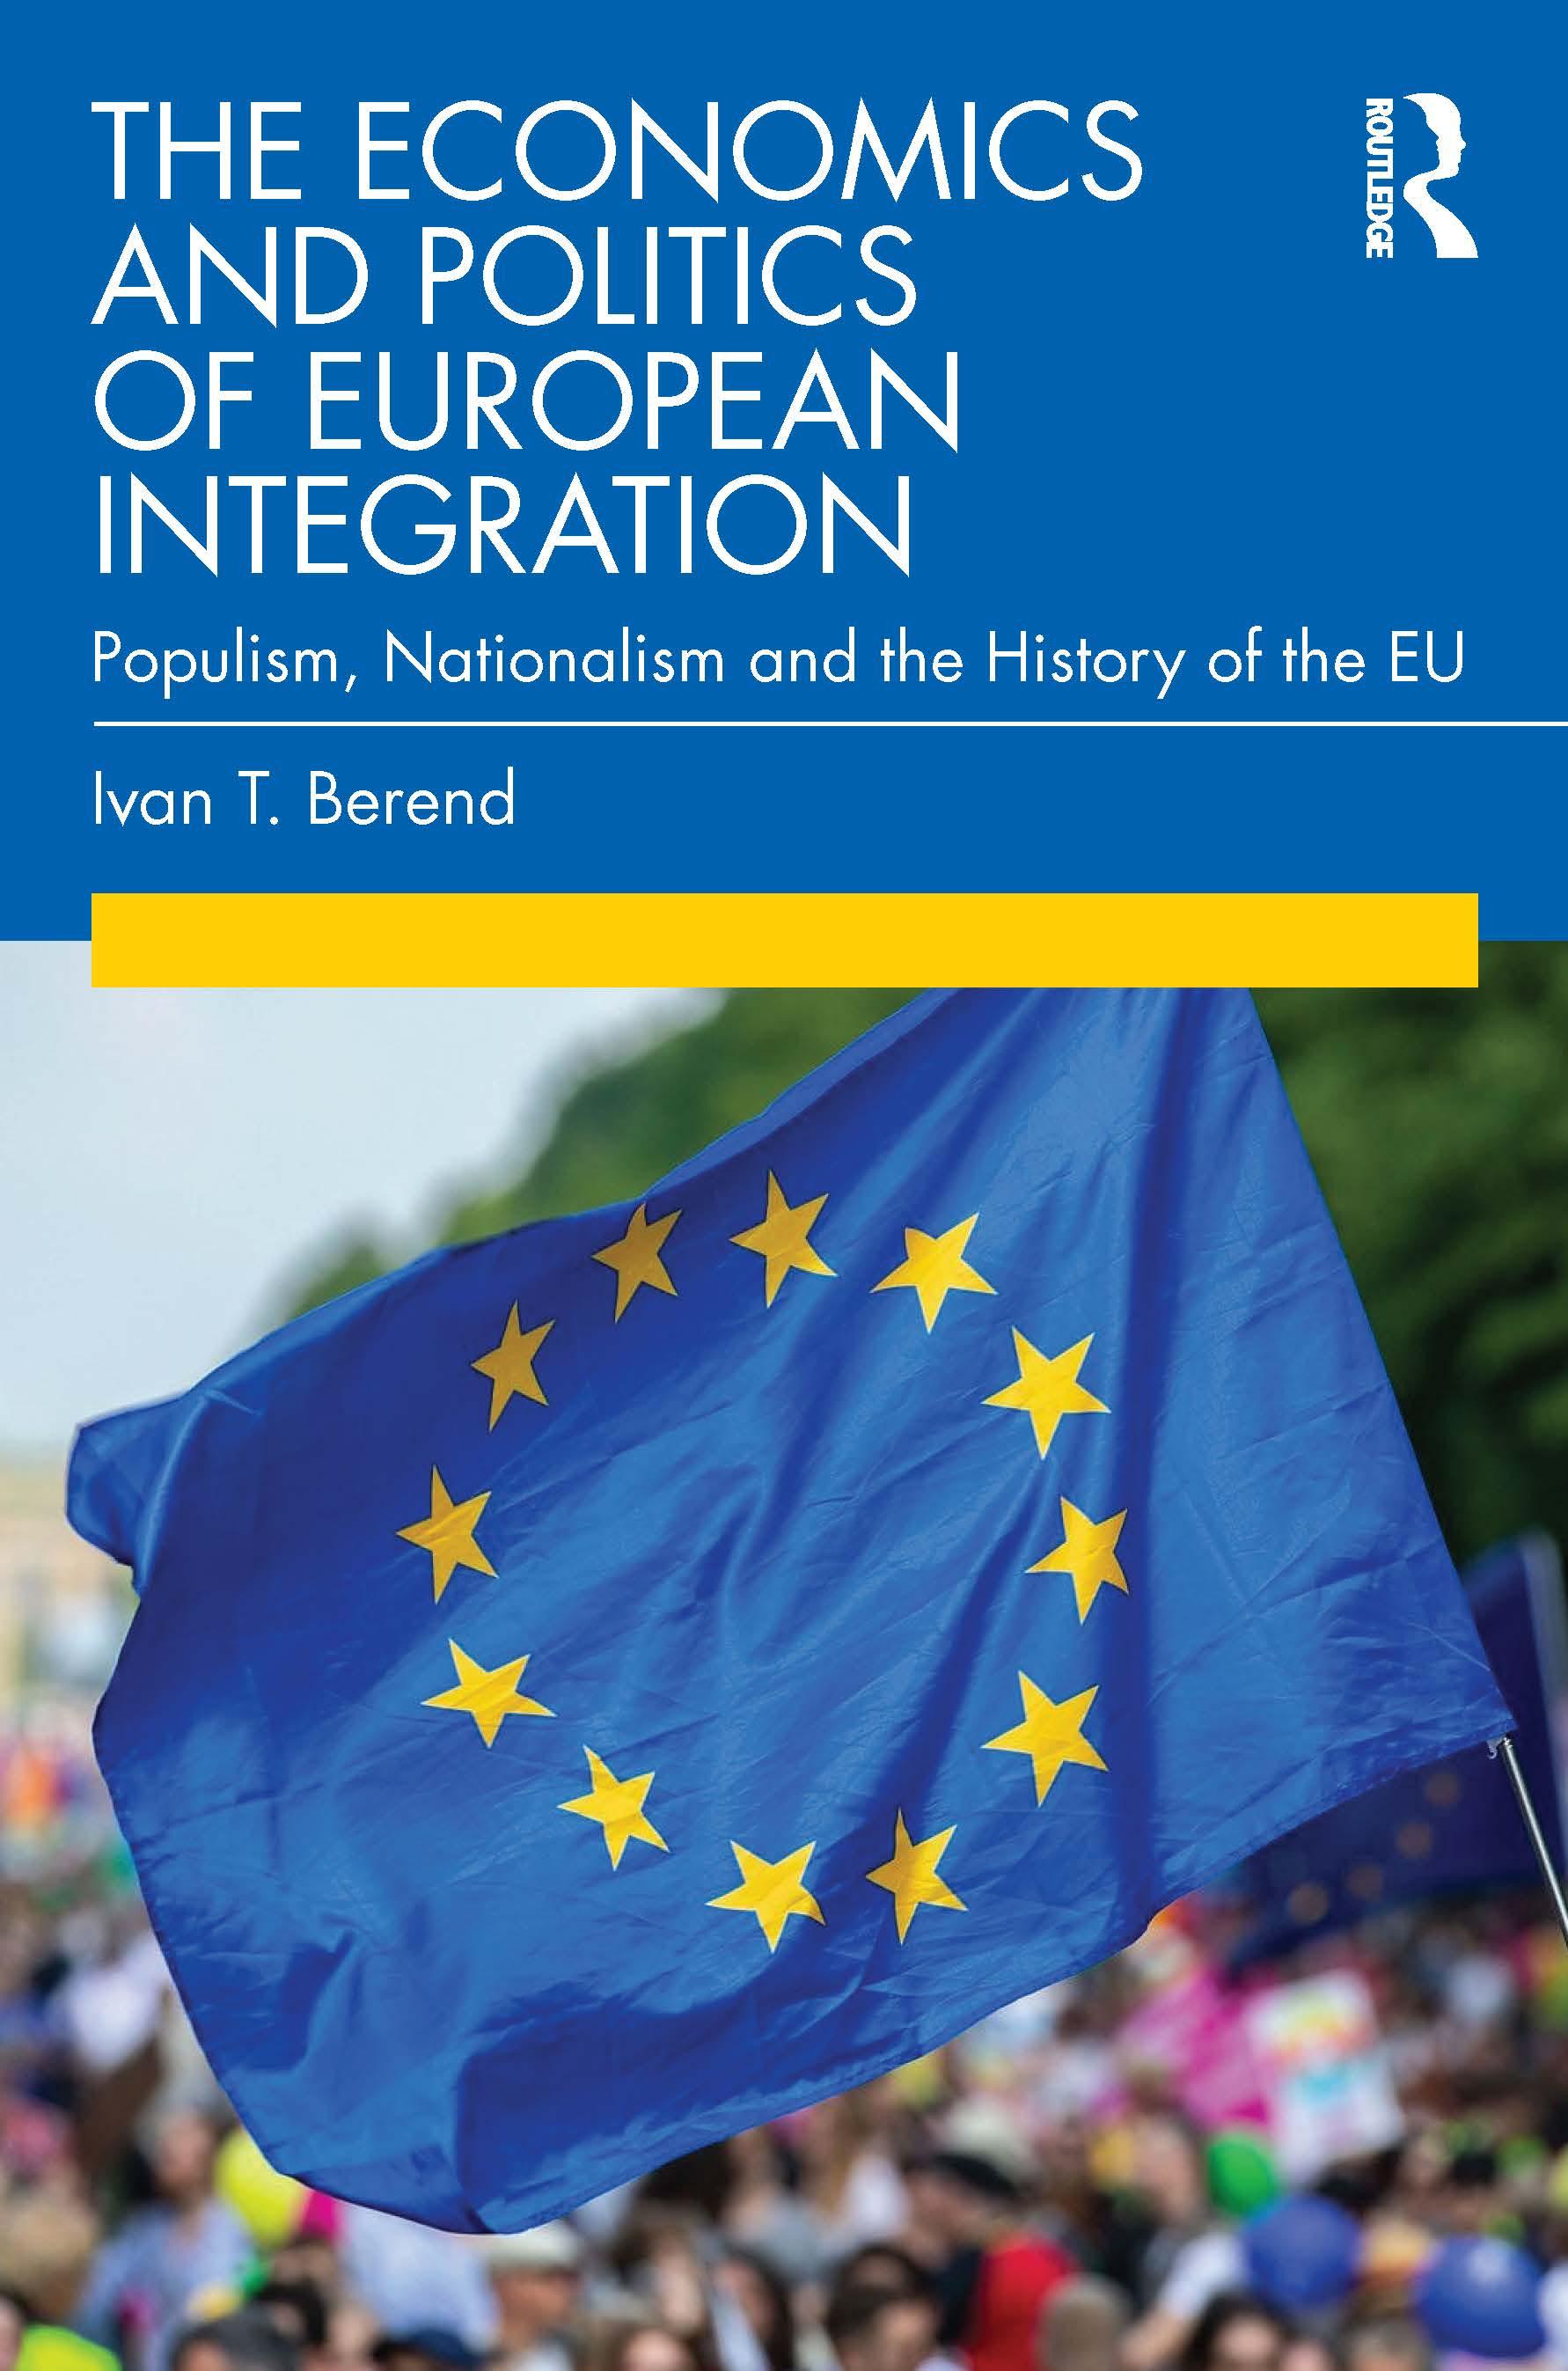 The Economics and Politics of European Integration